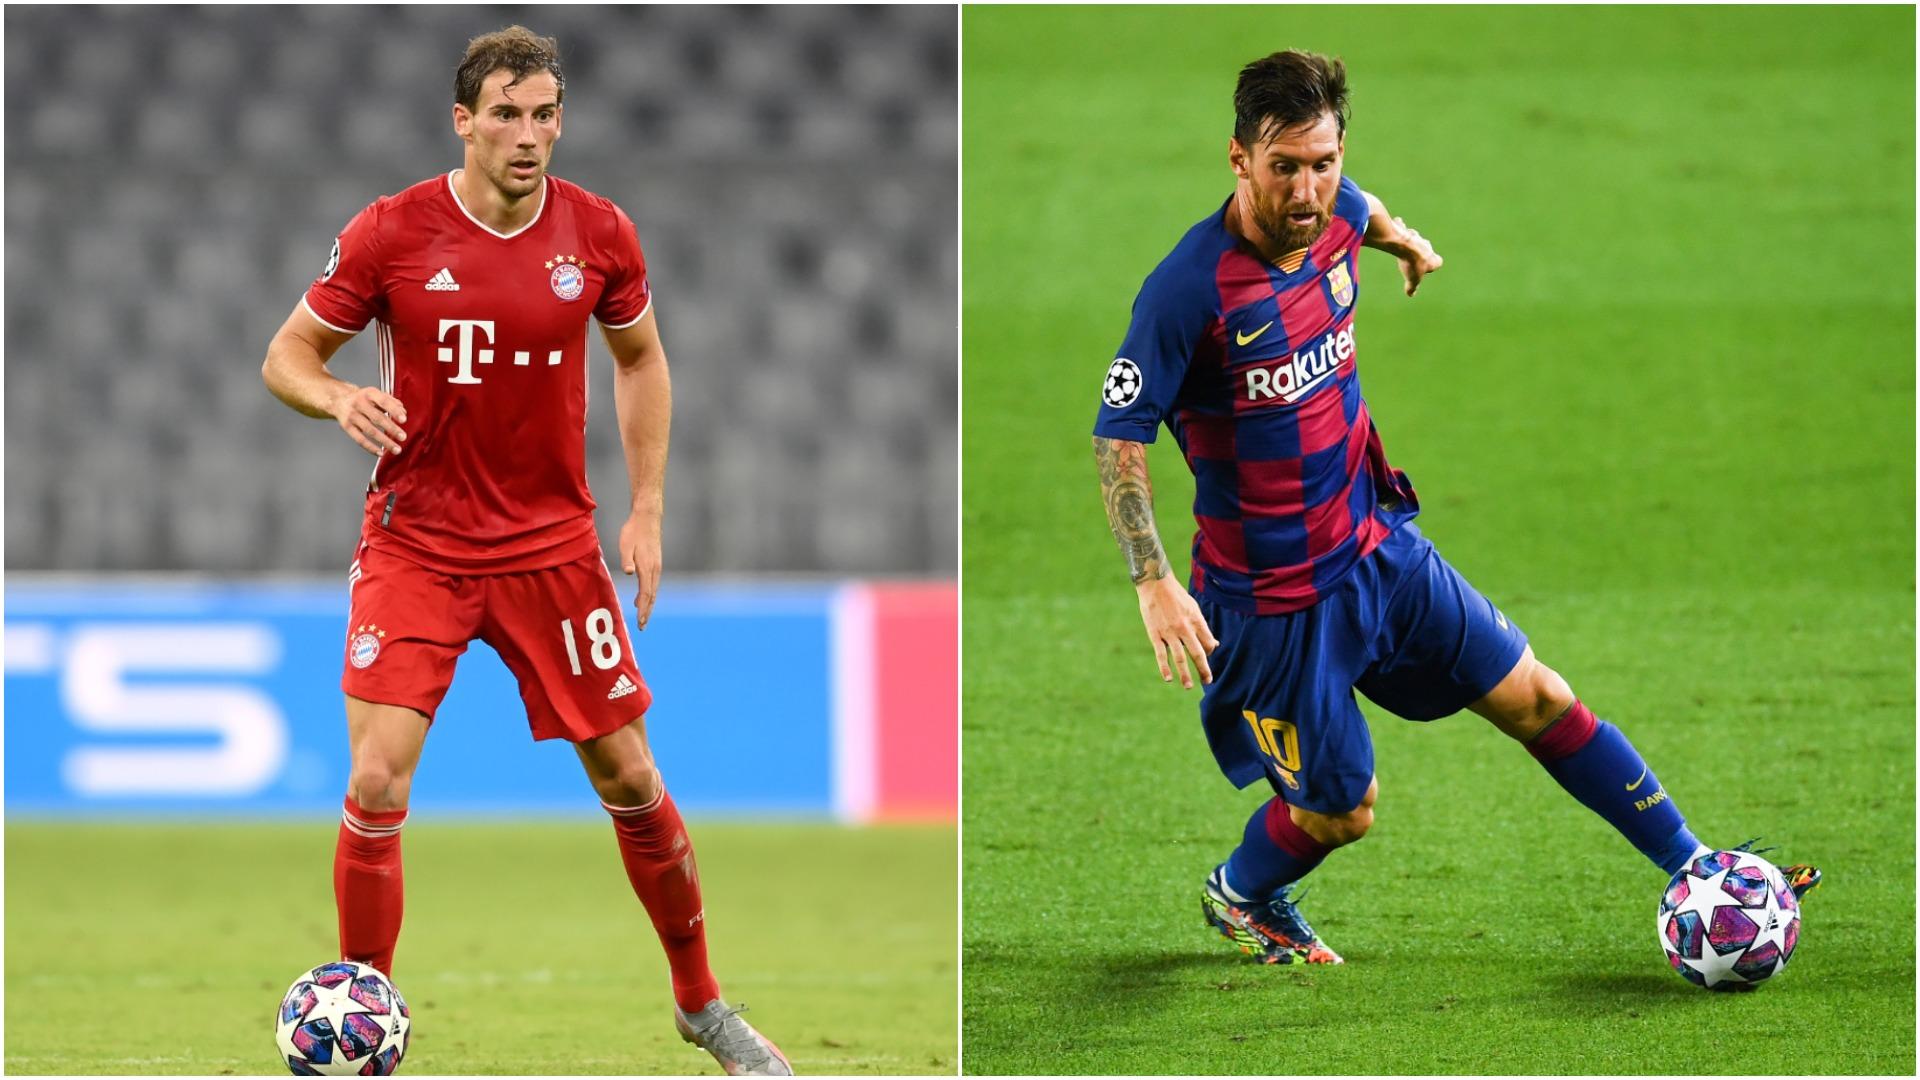 Goretzka relishing Messi challenge after Ronaldo tests